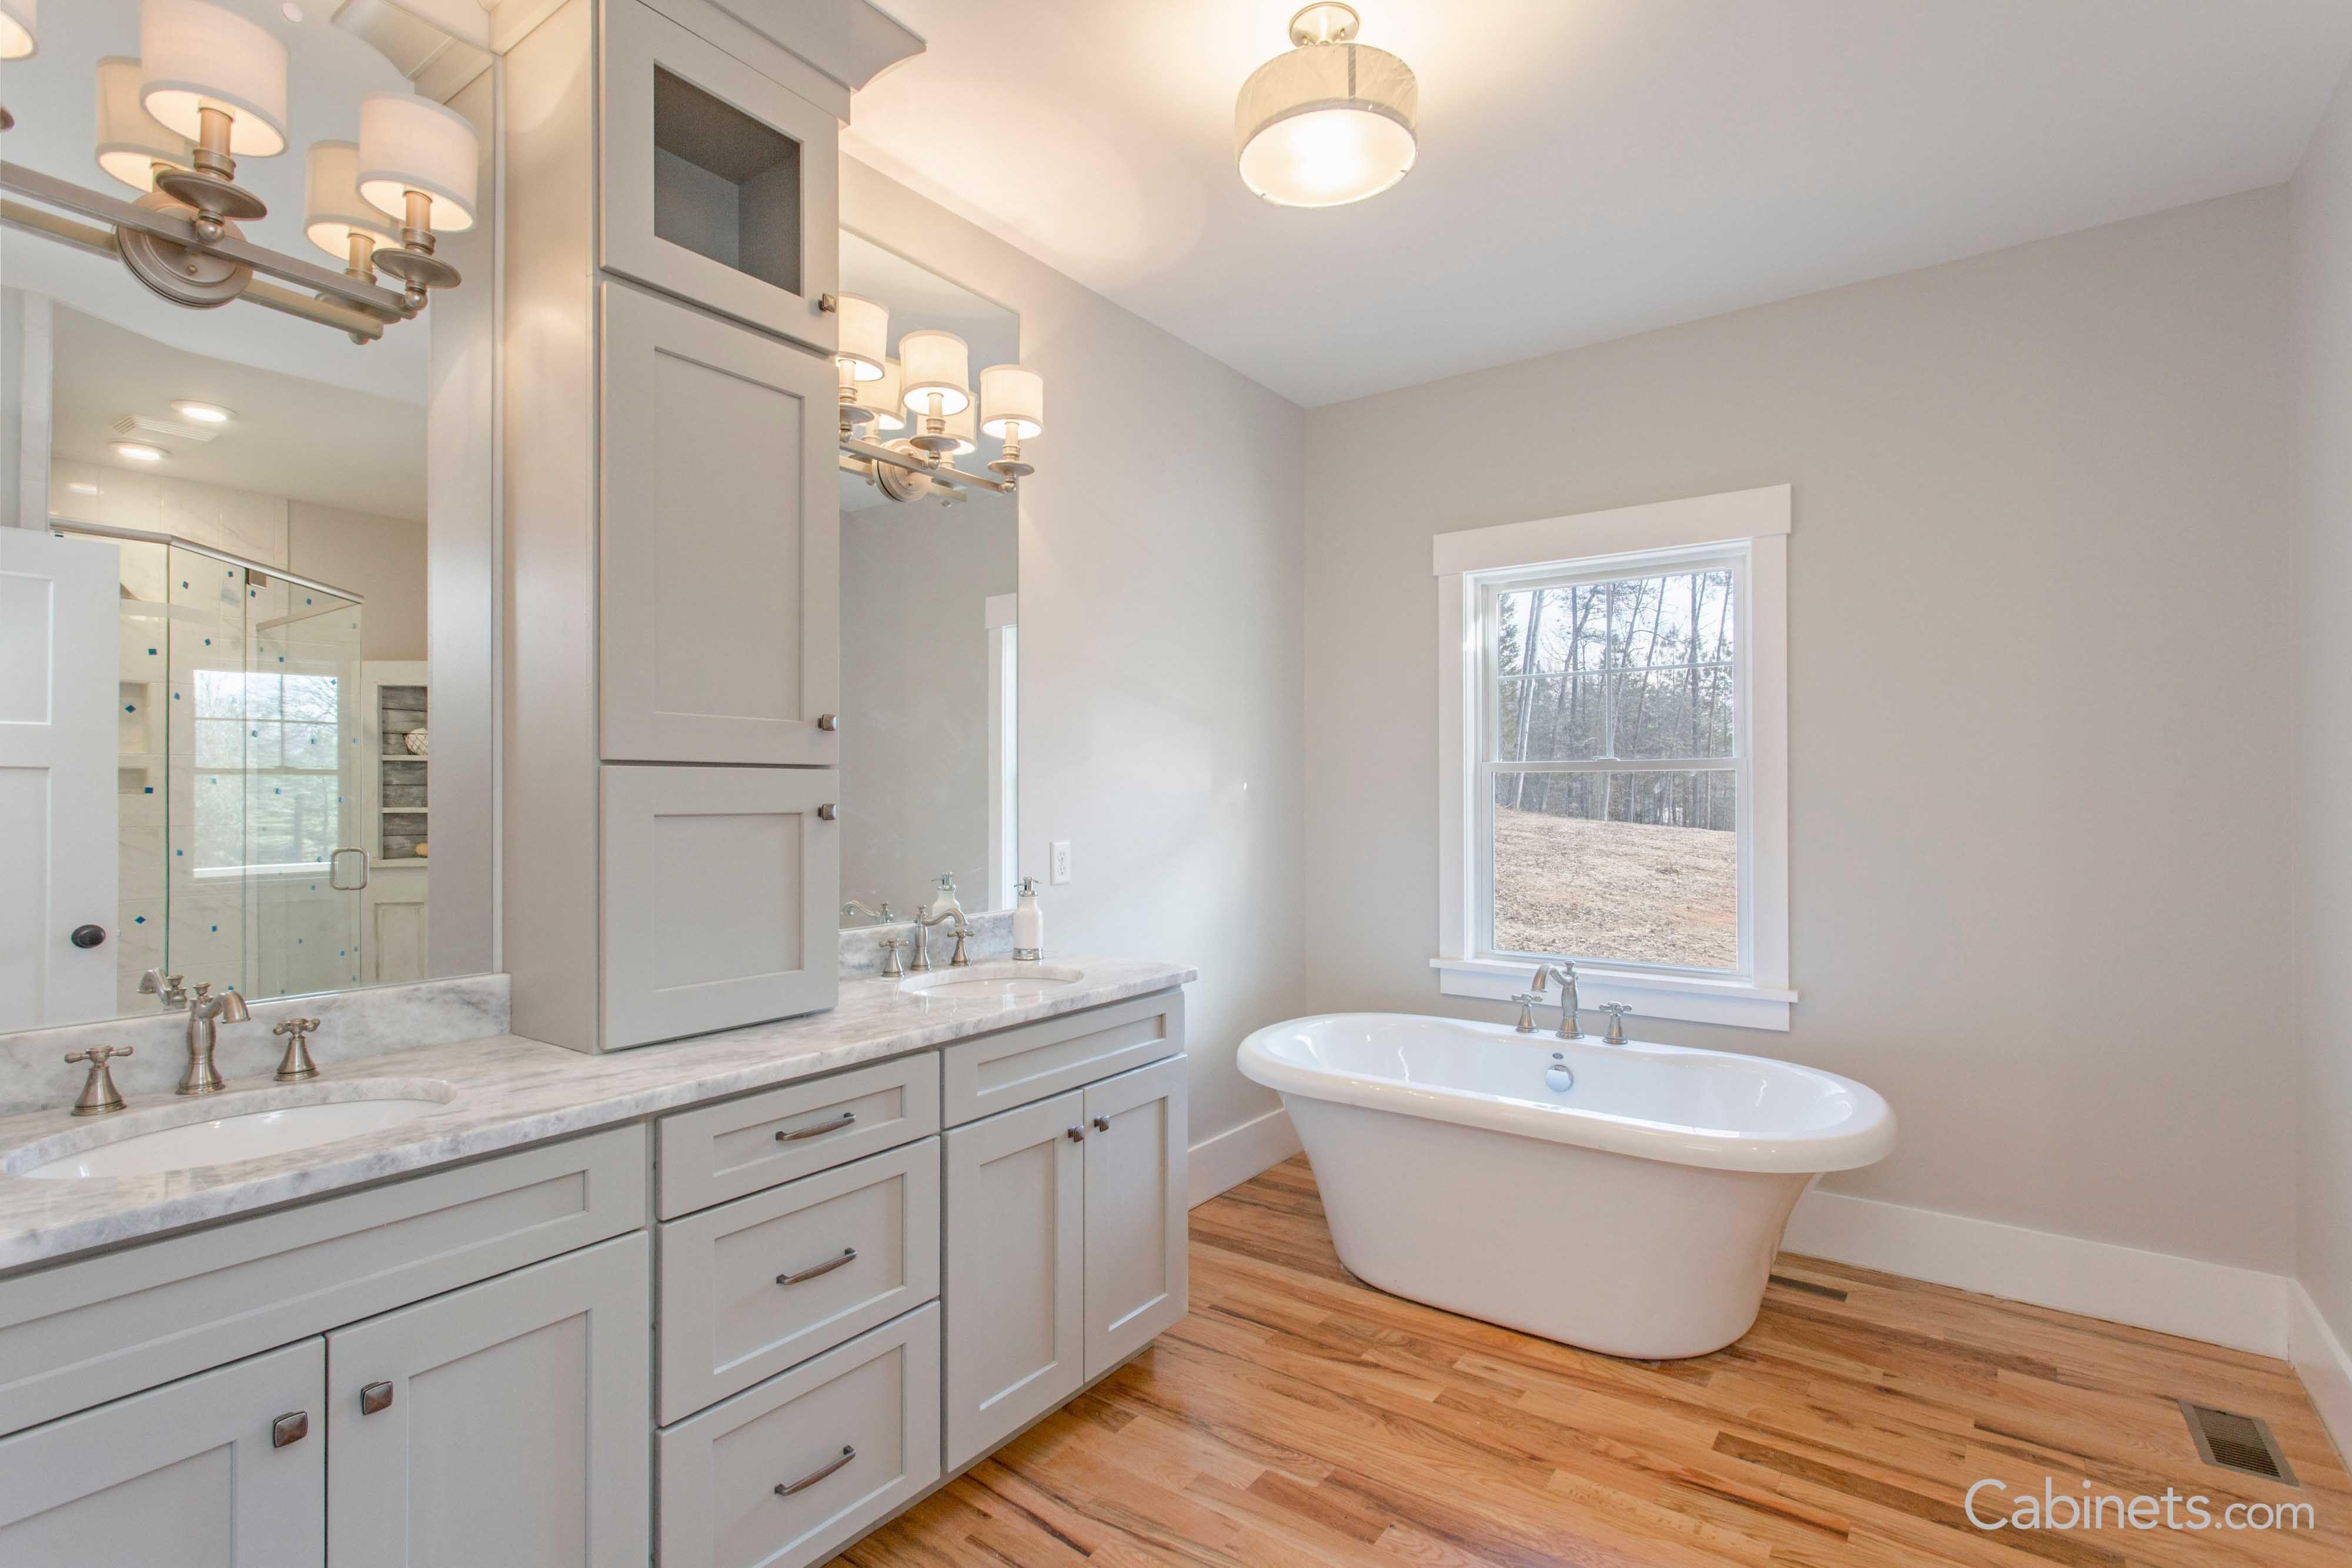 Beautiful Bathroom Vanity Ideas Cabinets Com Beautiful Bathroom Vanity Wood Floor Bathroom Master Bathroom Vanity [ 2667 x 4000 Pixel ]